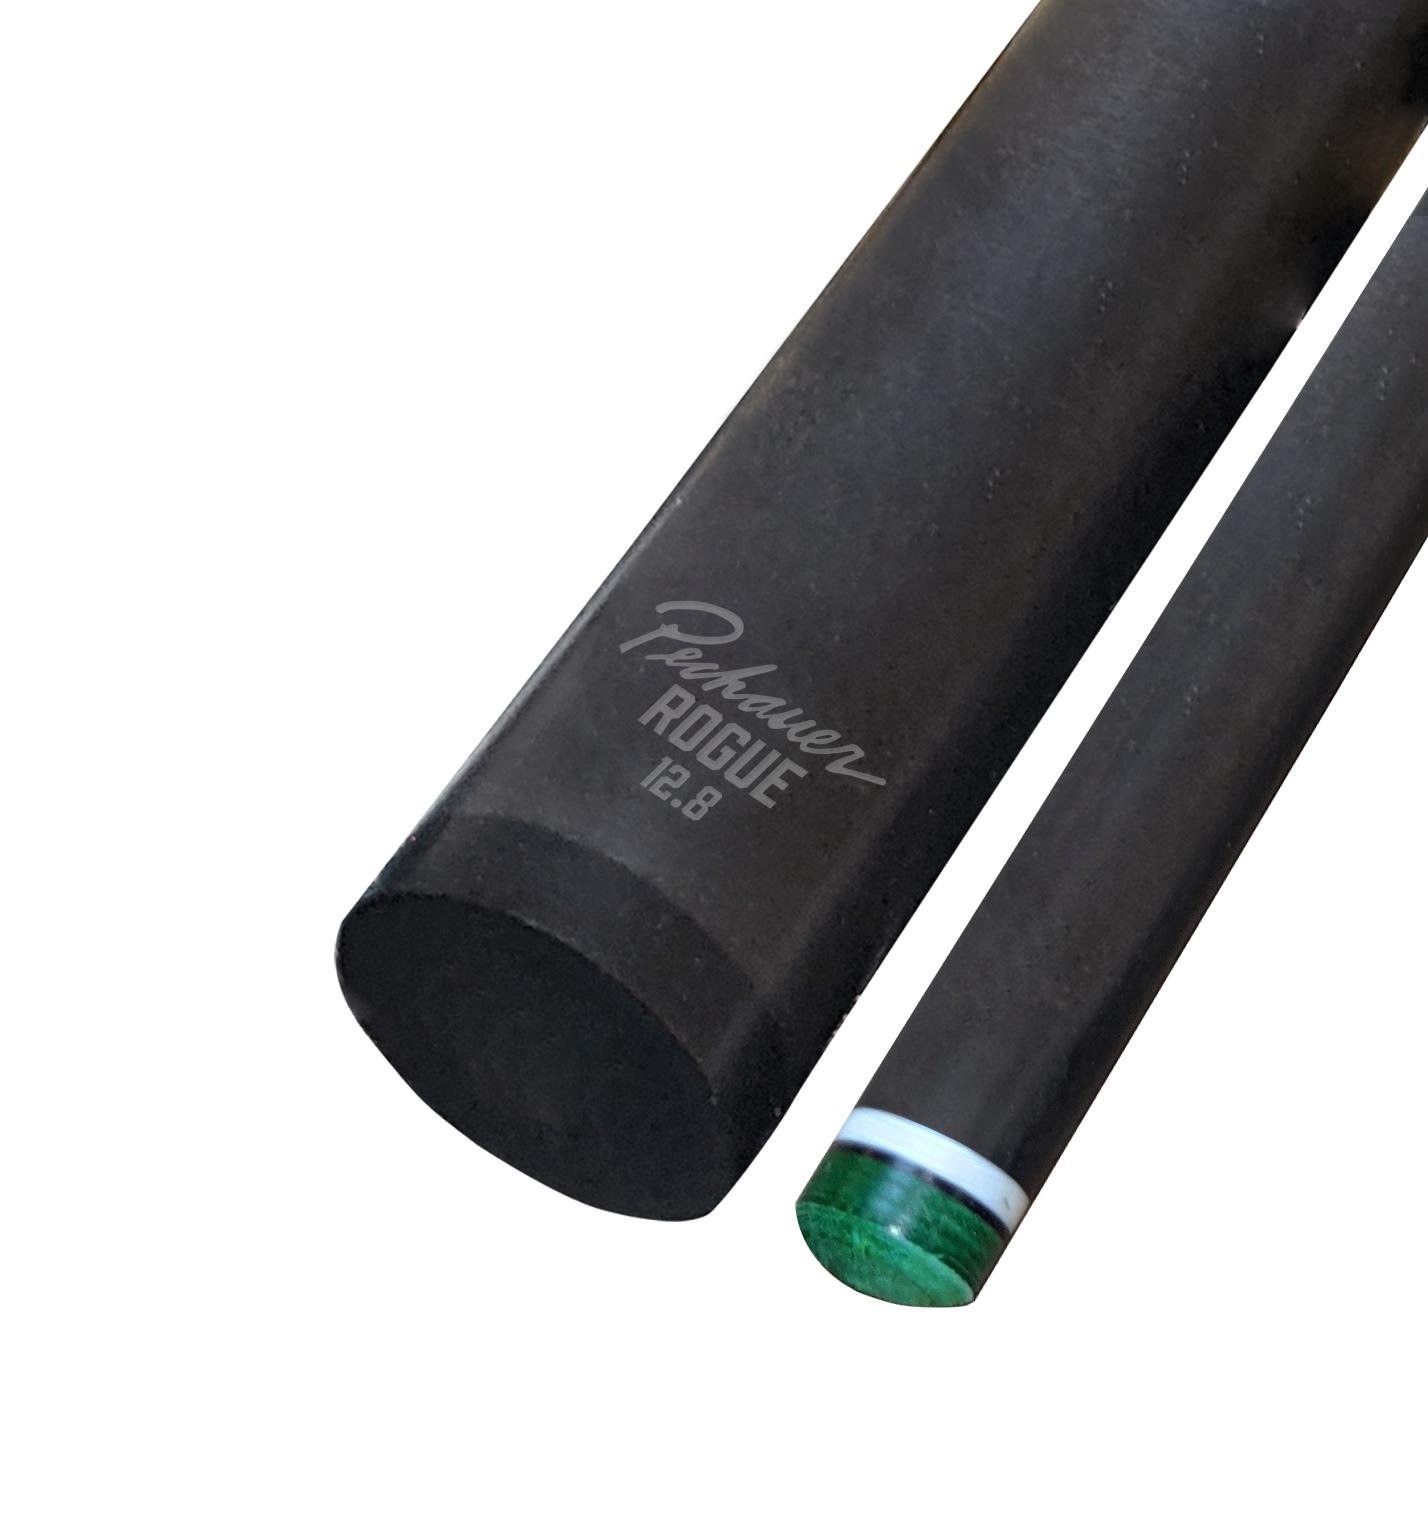 rogue-carbon-fiber-shaft-custom-joints